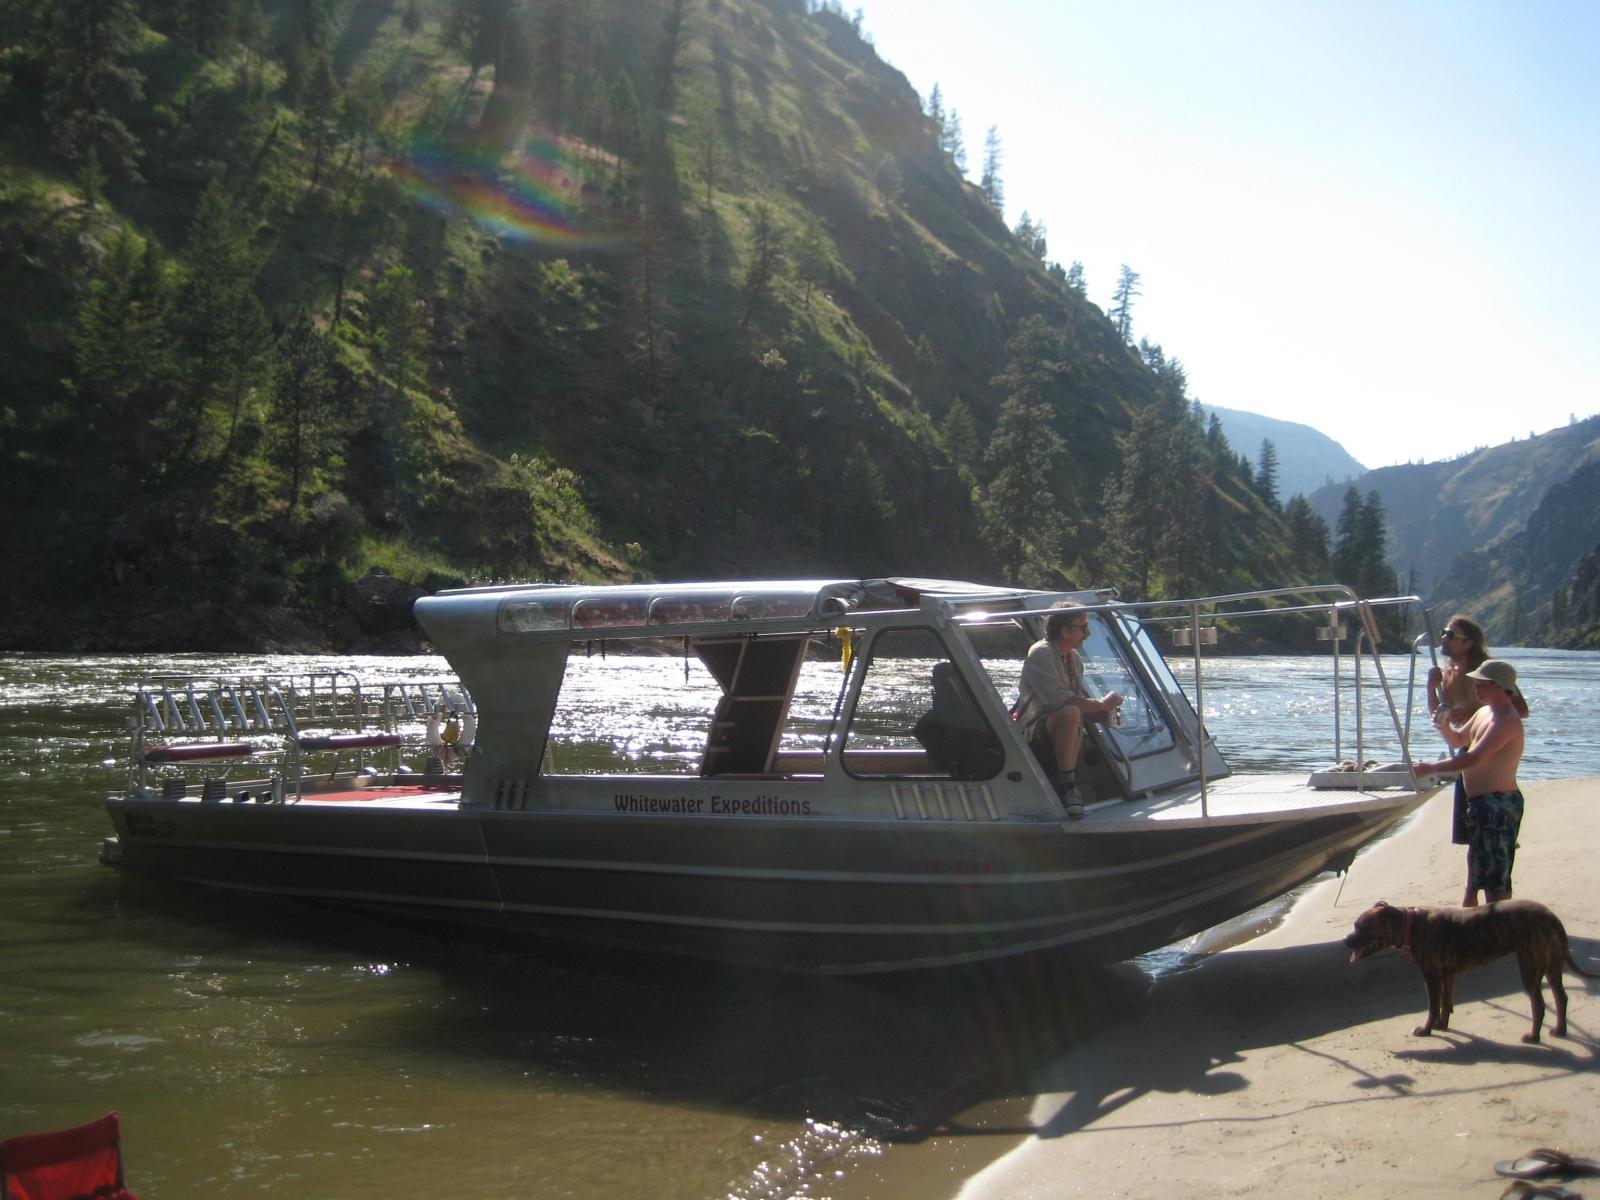 Click image for larger version  Name:2009 kayaking 465.jpg Views:193 Size:511.8 KB ID:2002